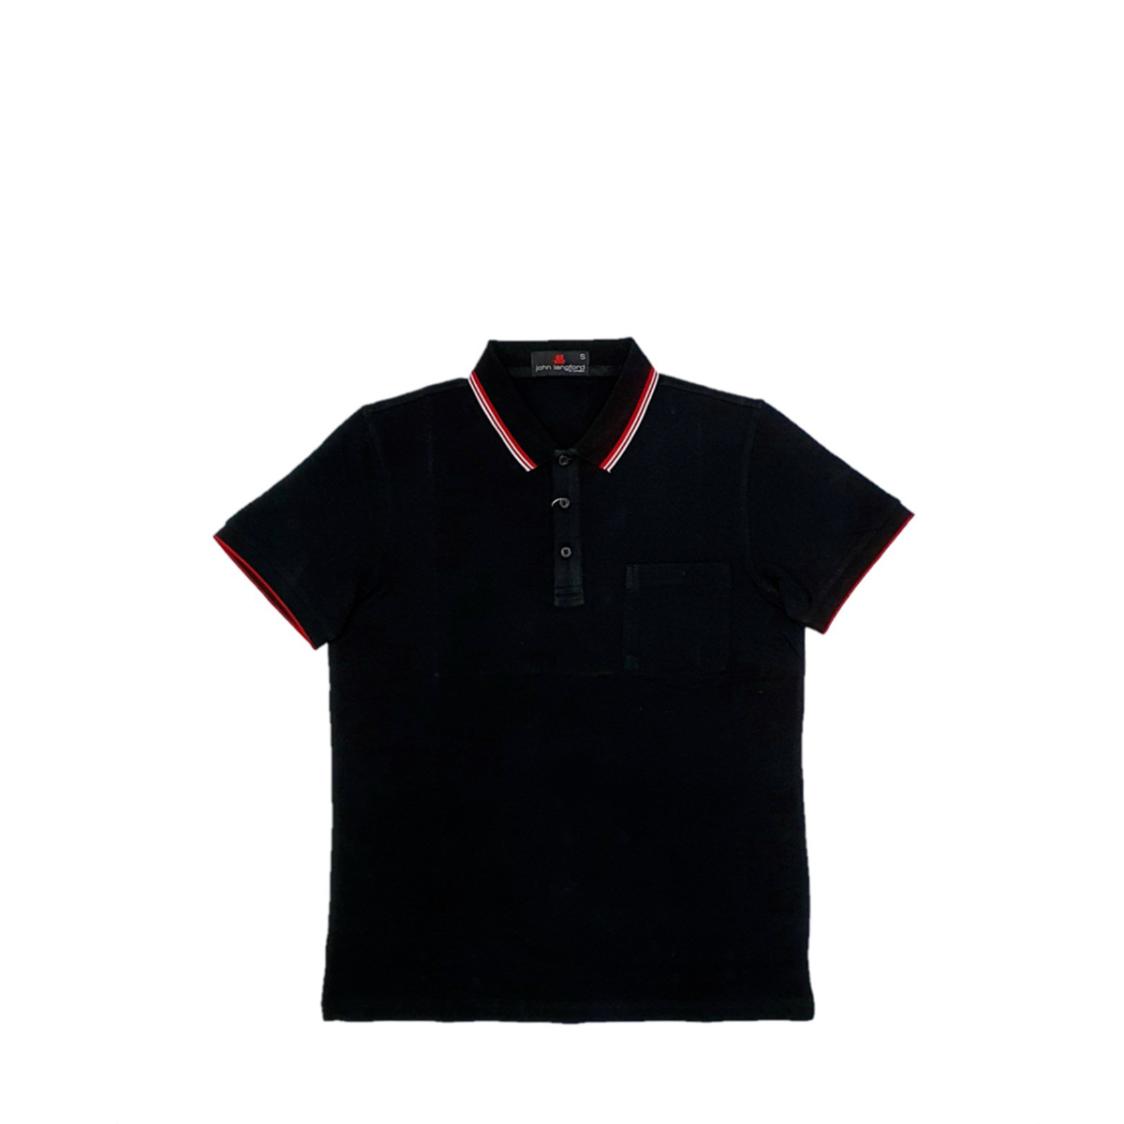 John Langford Pique Polo T-Shirt with Pocket Black